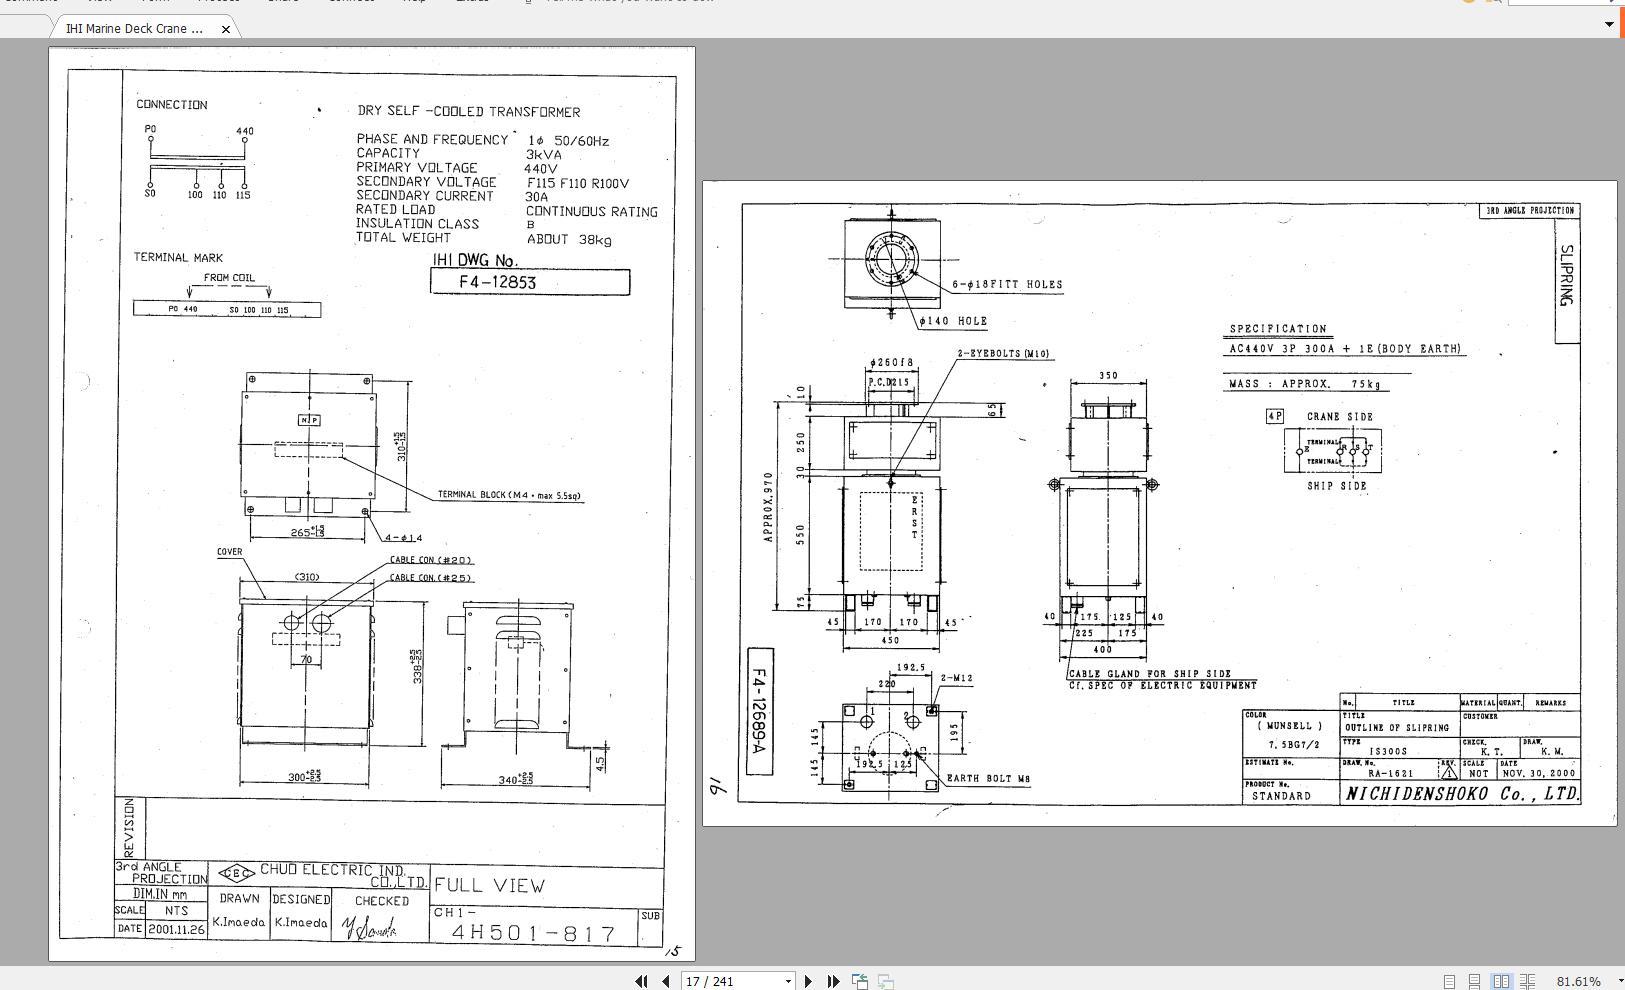 Ihi Marine Deck Crane Electrical Circuit Diagram Equipment - Homepage